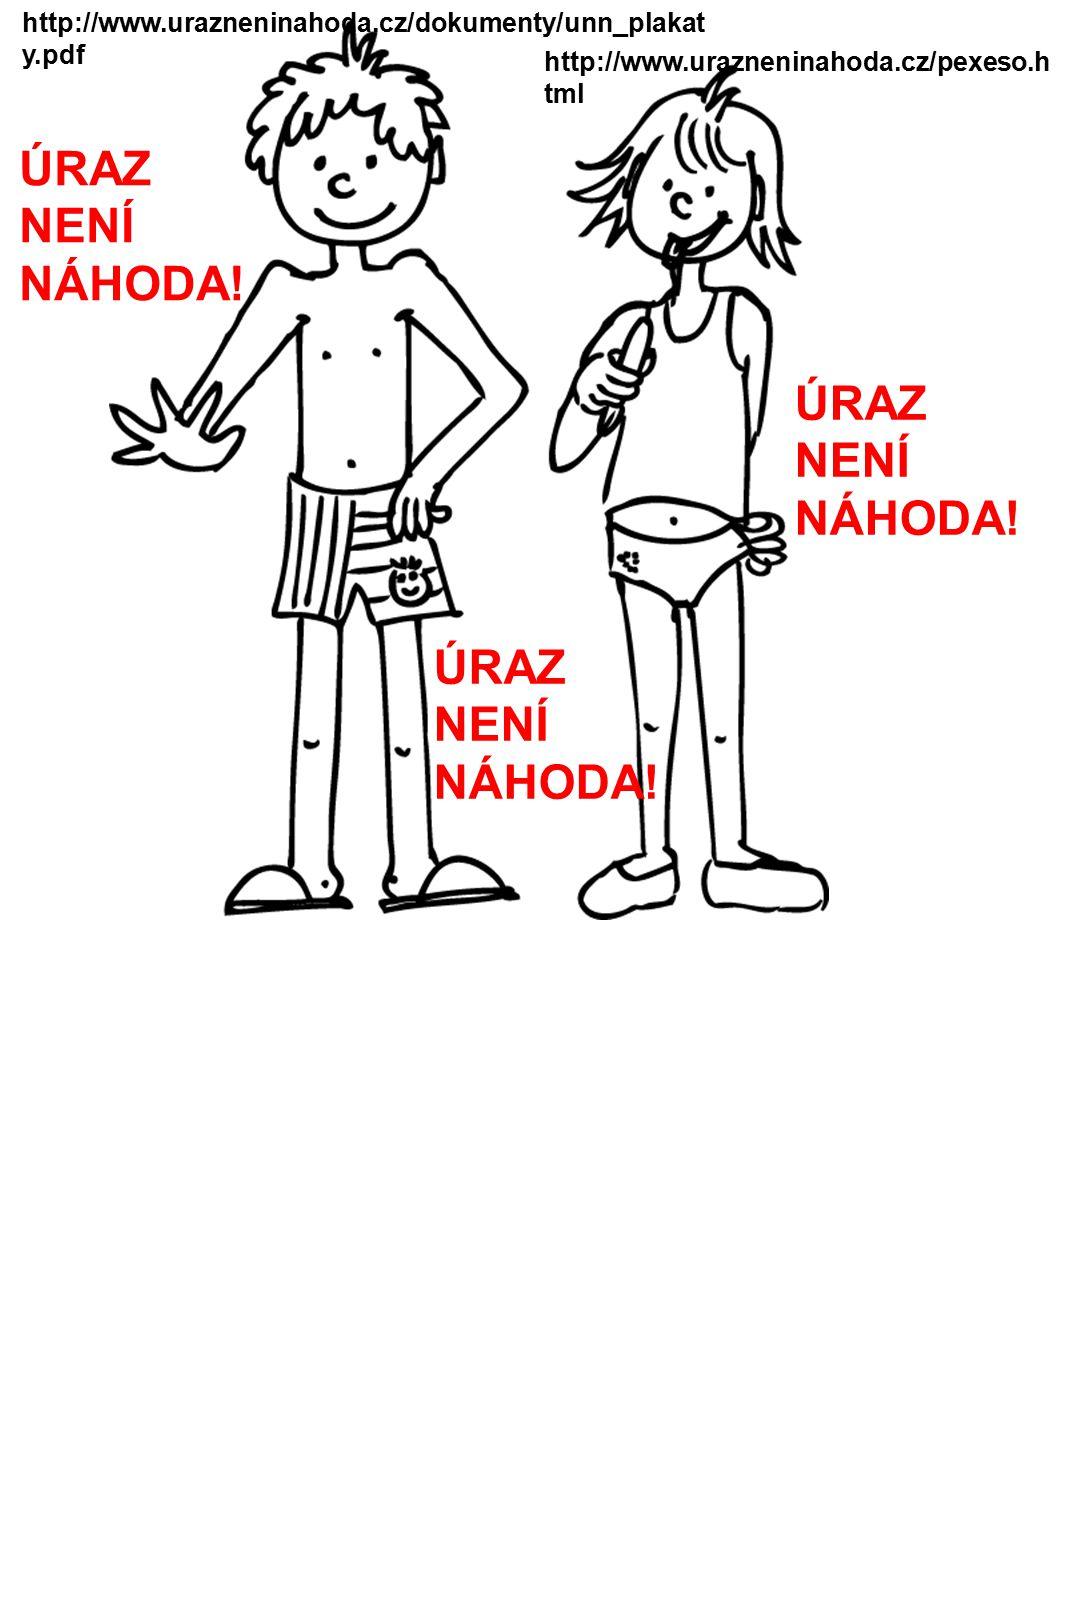 http://www.urazneninahoda.cz/dokumenty/unn_plakat y.pdf http://www.urazneninahoda.cz/pexeso.h tml ÚRAZ NENÍ NÁHODA.